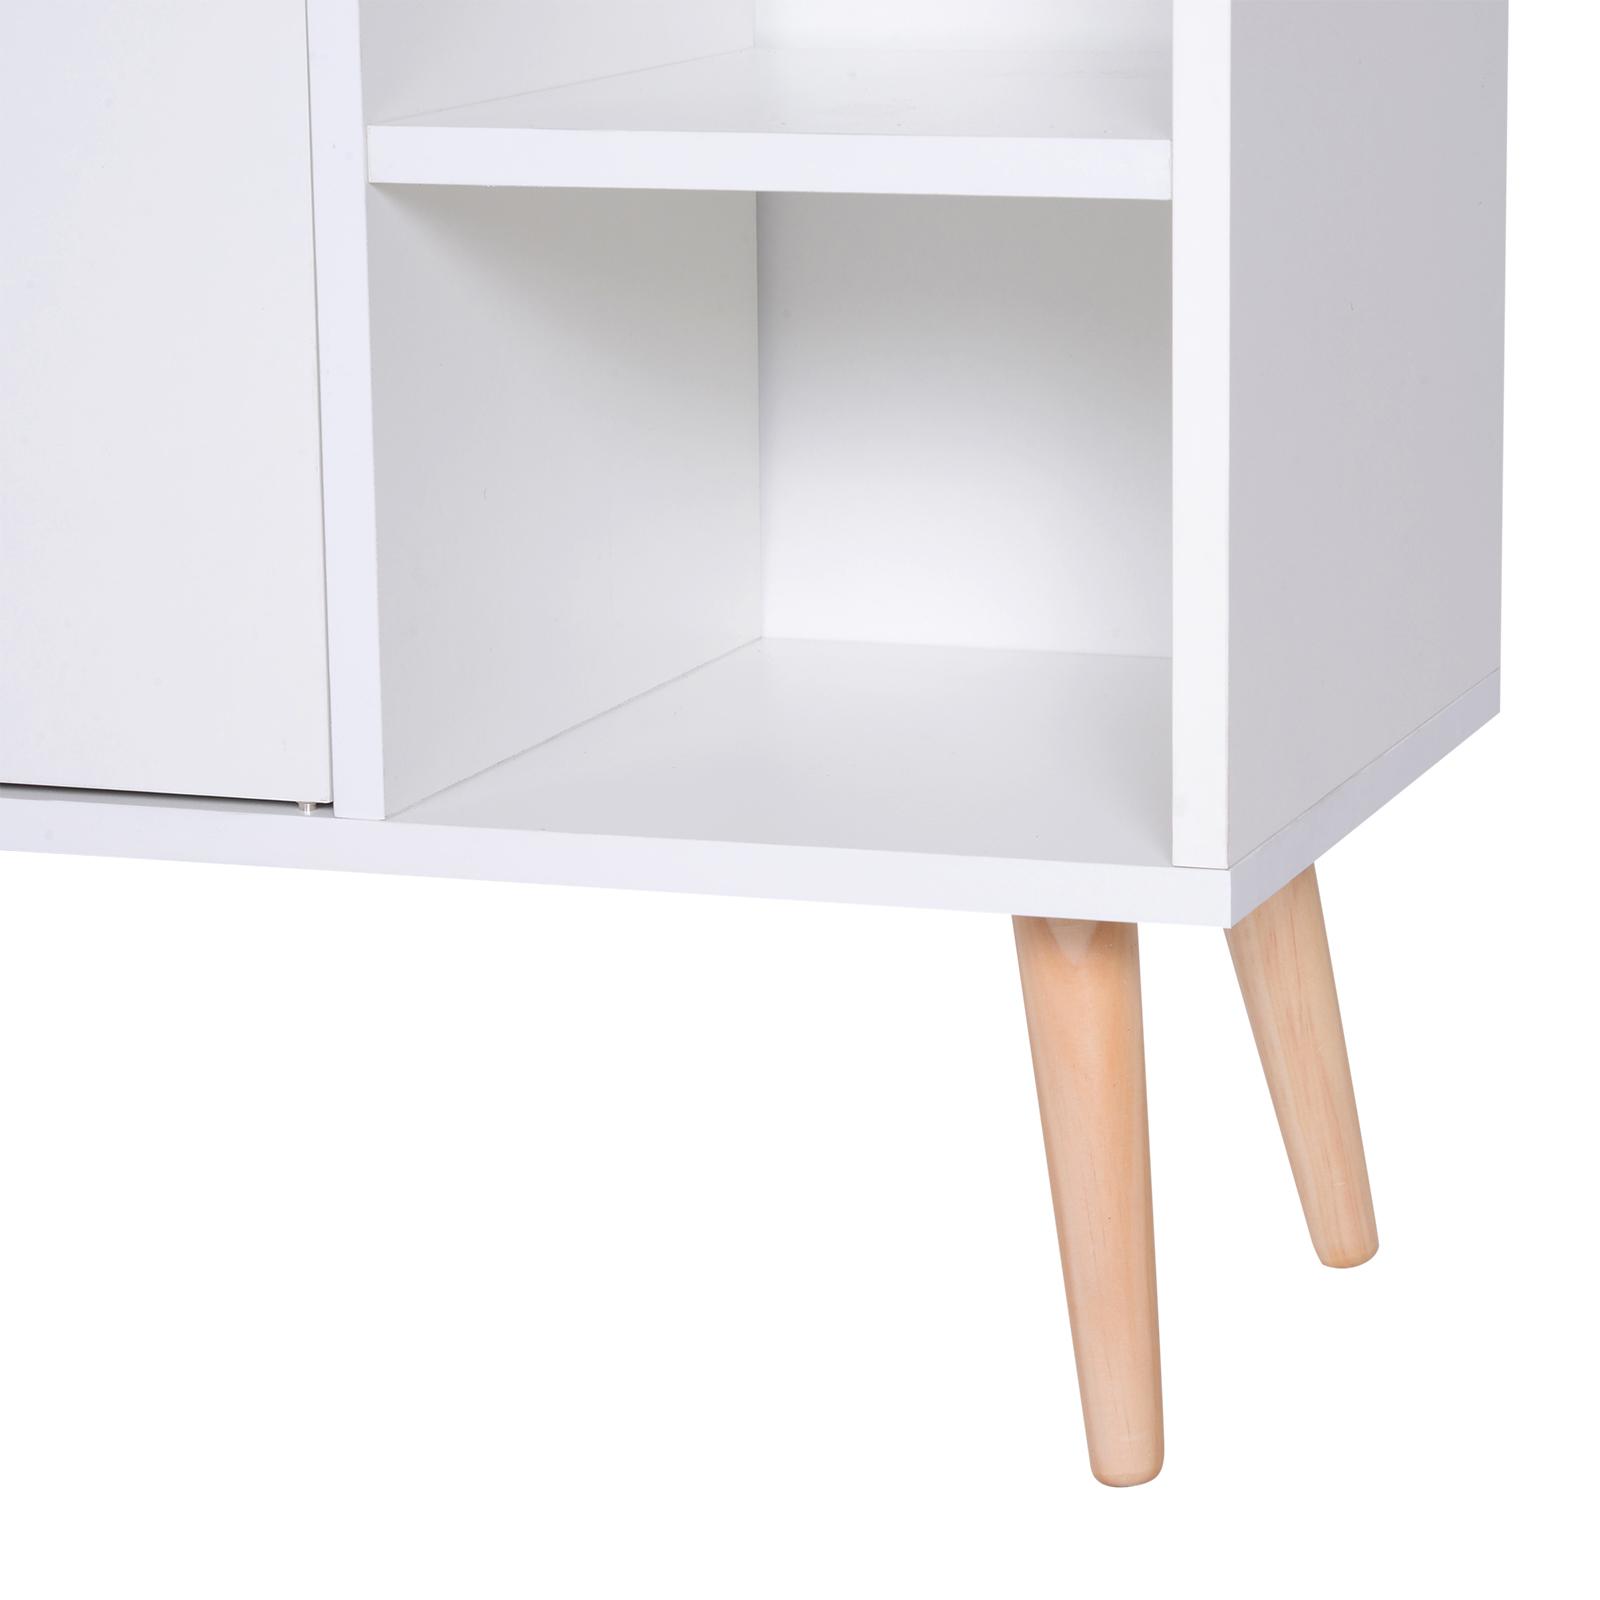 thumbnail 12 - Side-Cabinet-Hallway-Storage-Unit-Console-Table-Entrance-Shelf-Cupboard-2-color